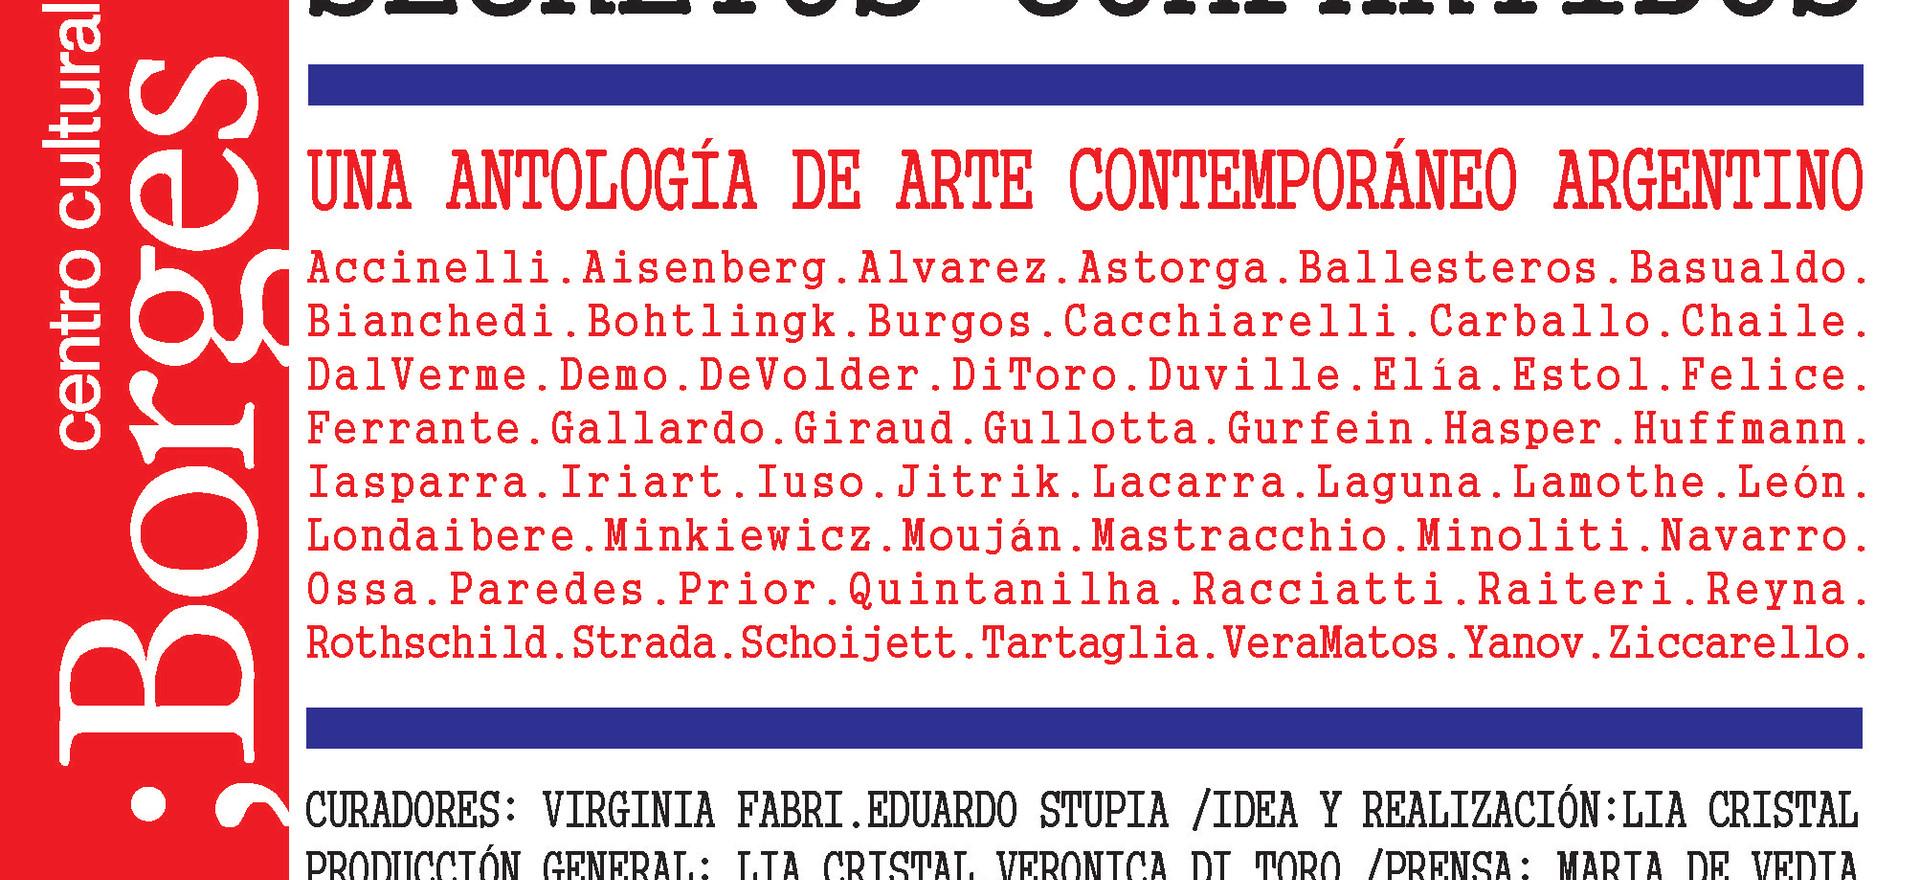 2019, Secretos compartidos, Centro Cultural Borges, Buenos Aires